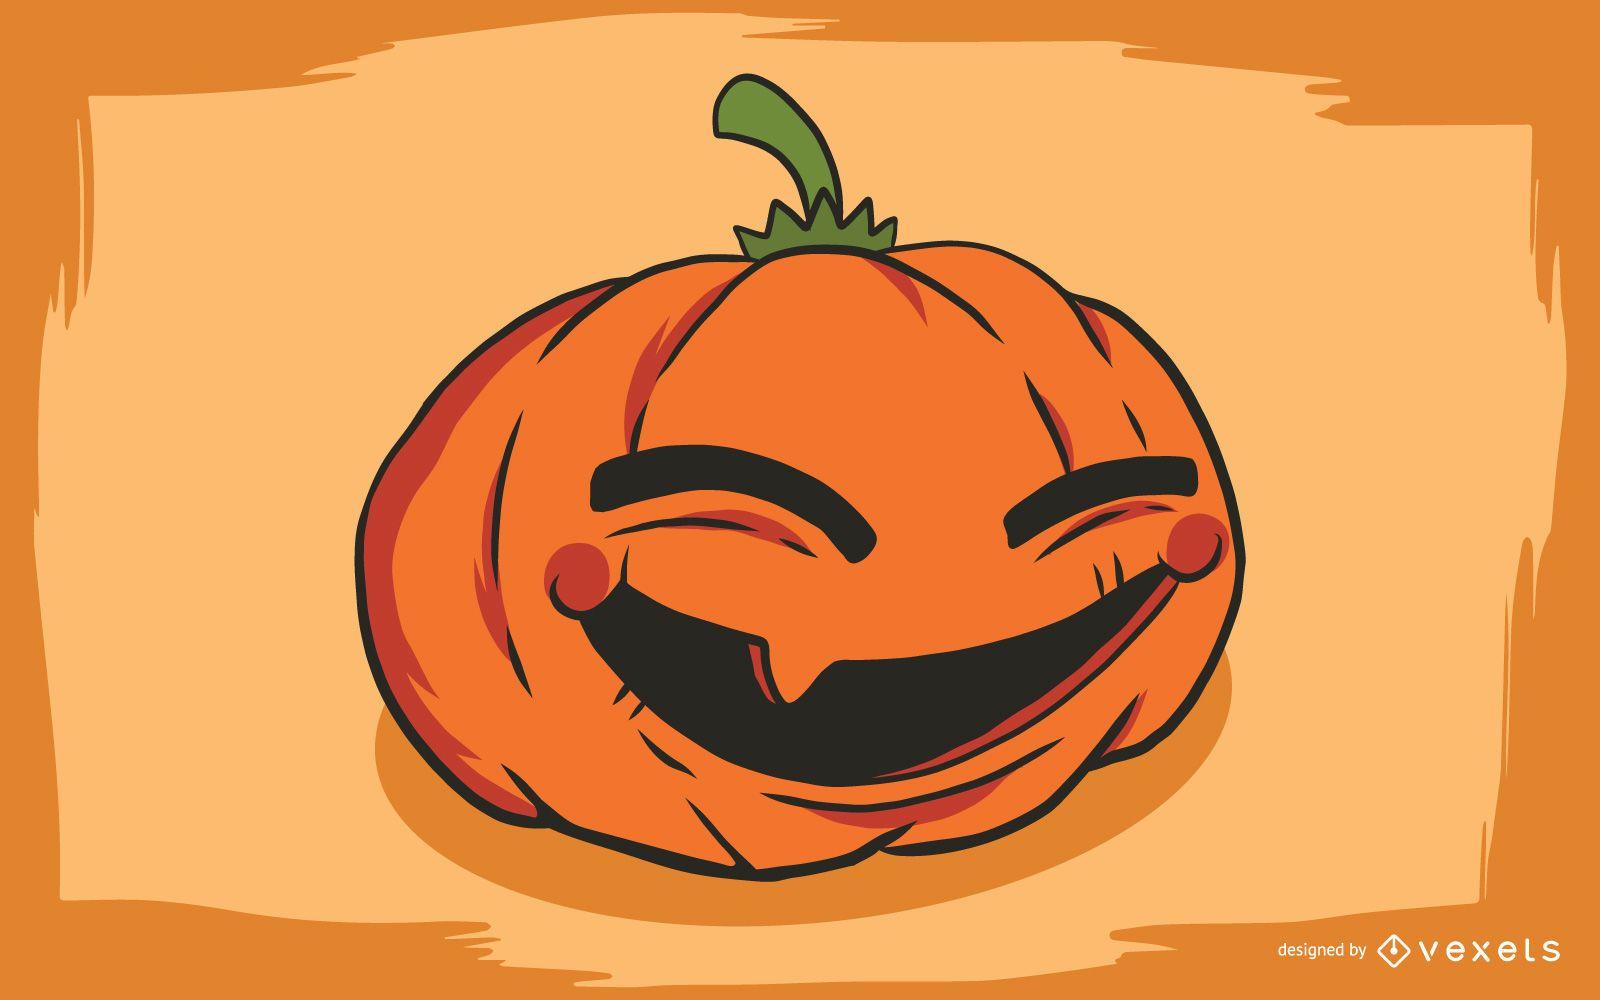 Lindo arte de Halloween con calabazas